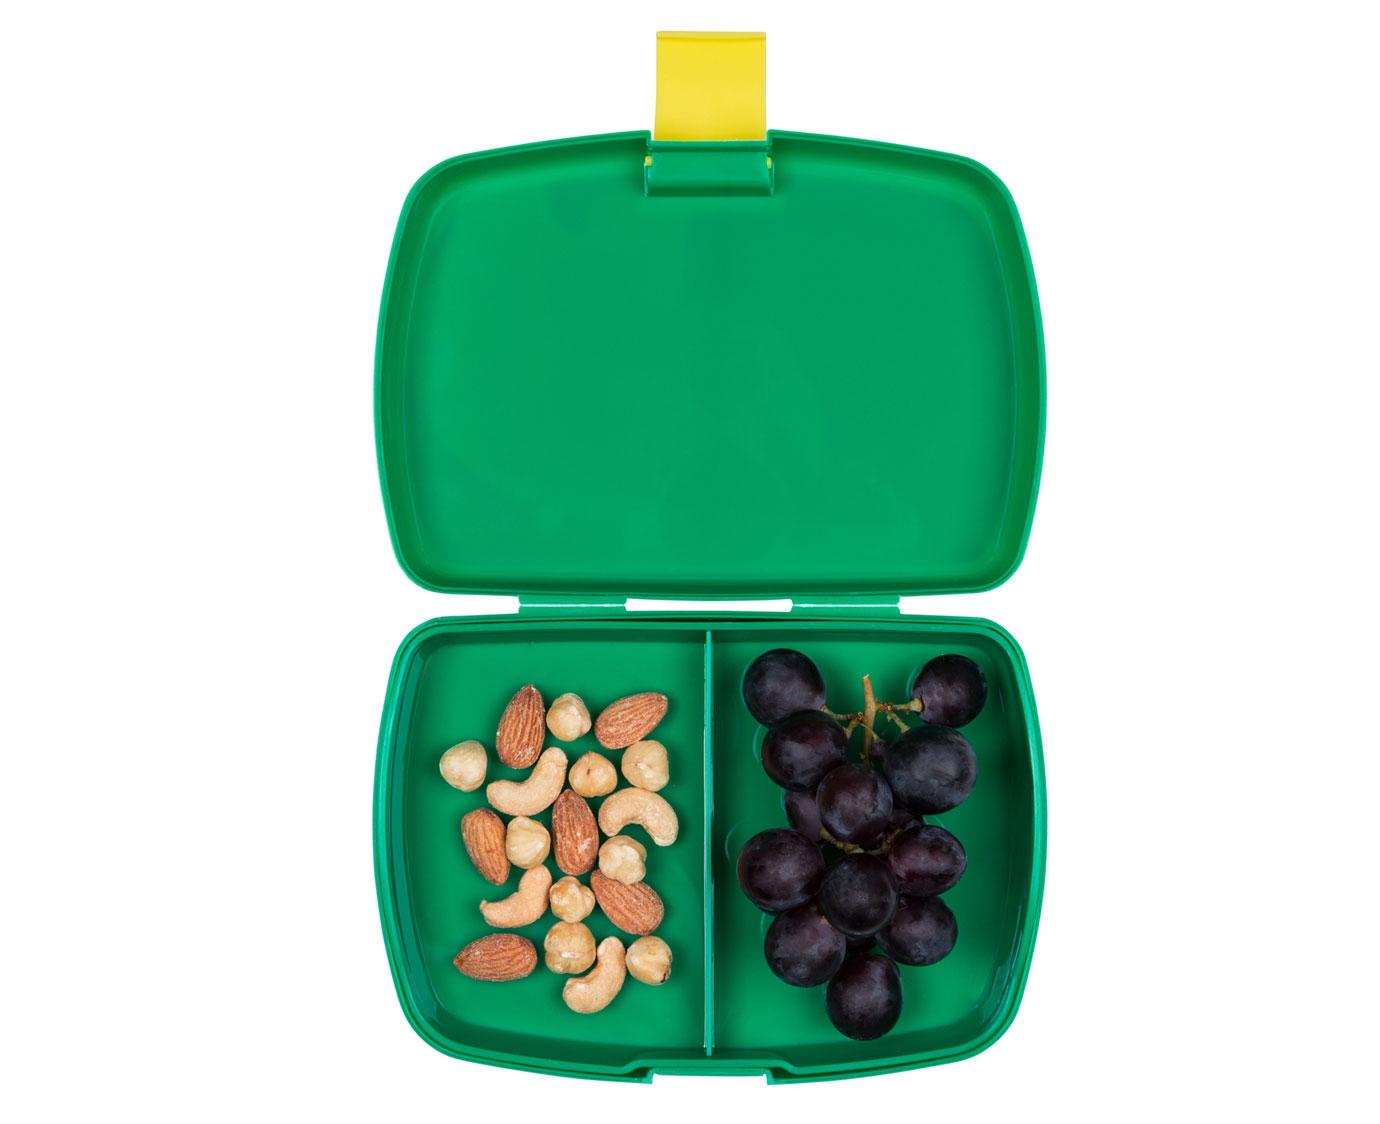 Lunchbox 'Neushoorn'